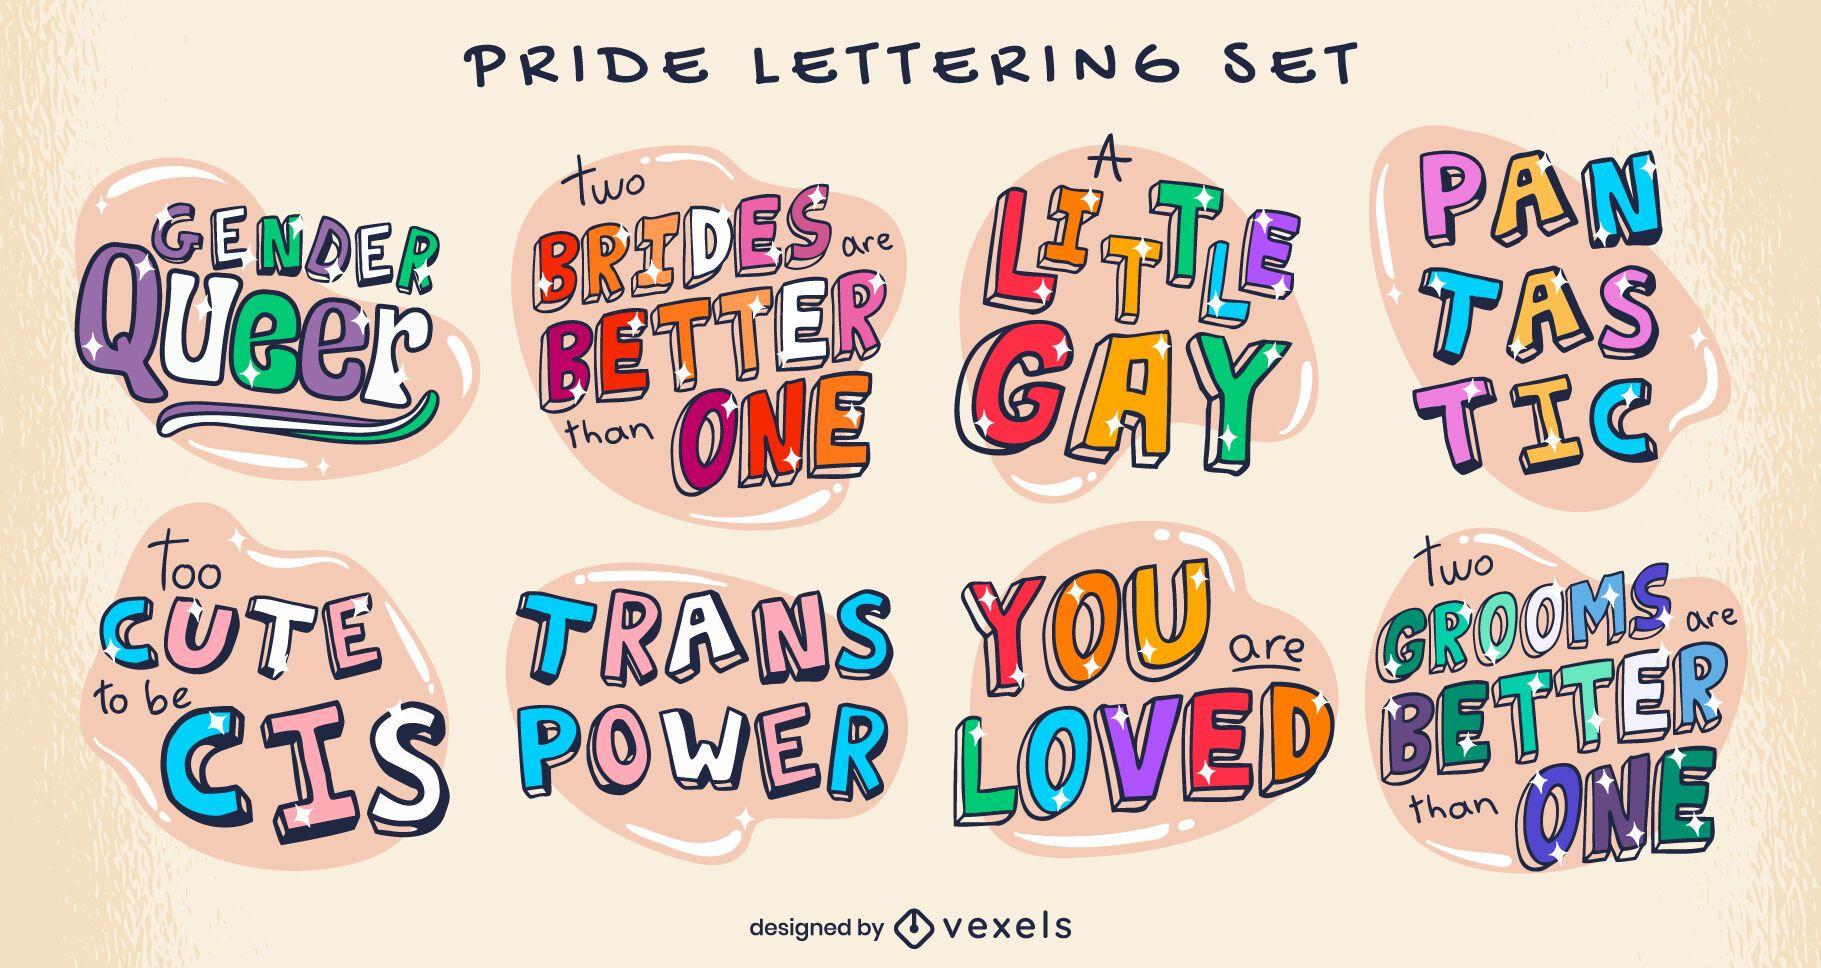 Lgbt pride month lettering hand drawn set